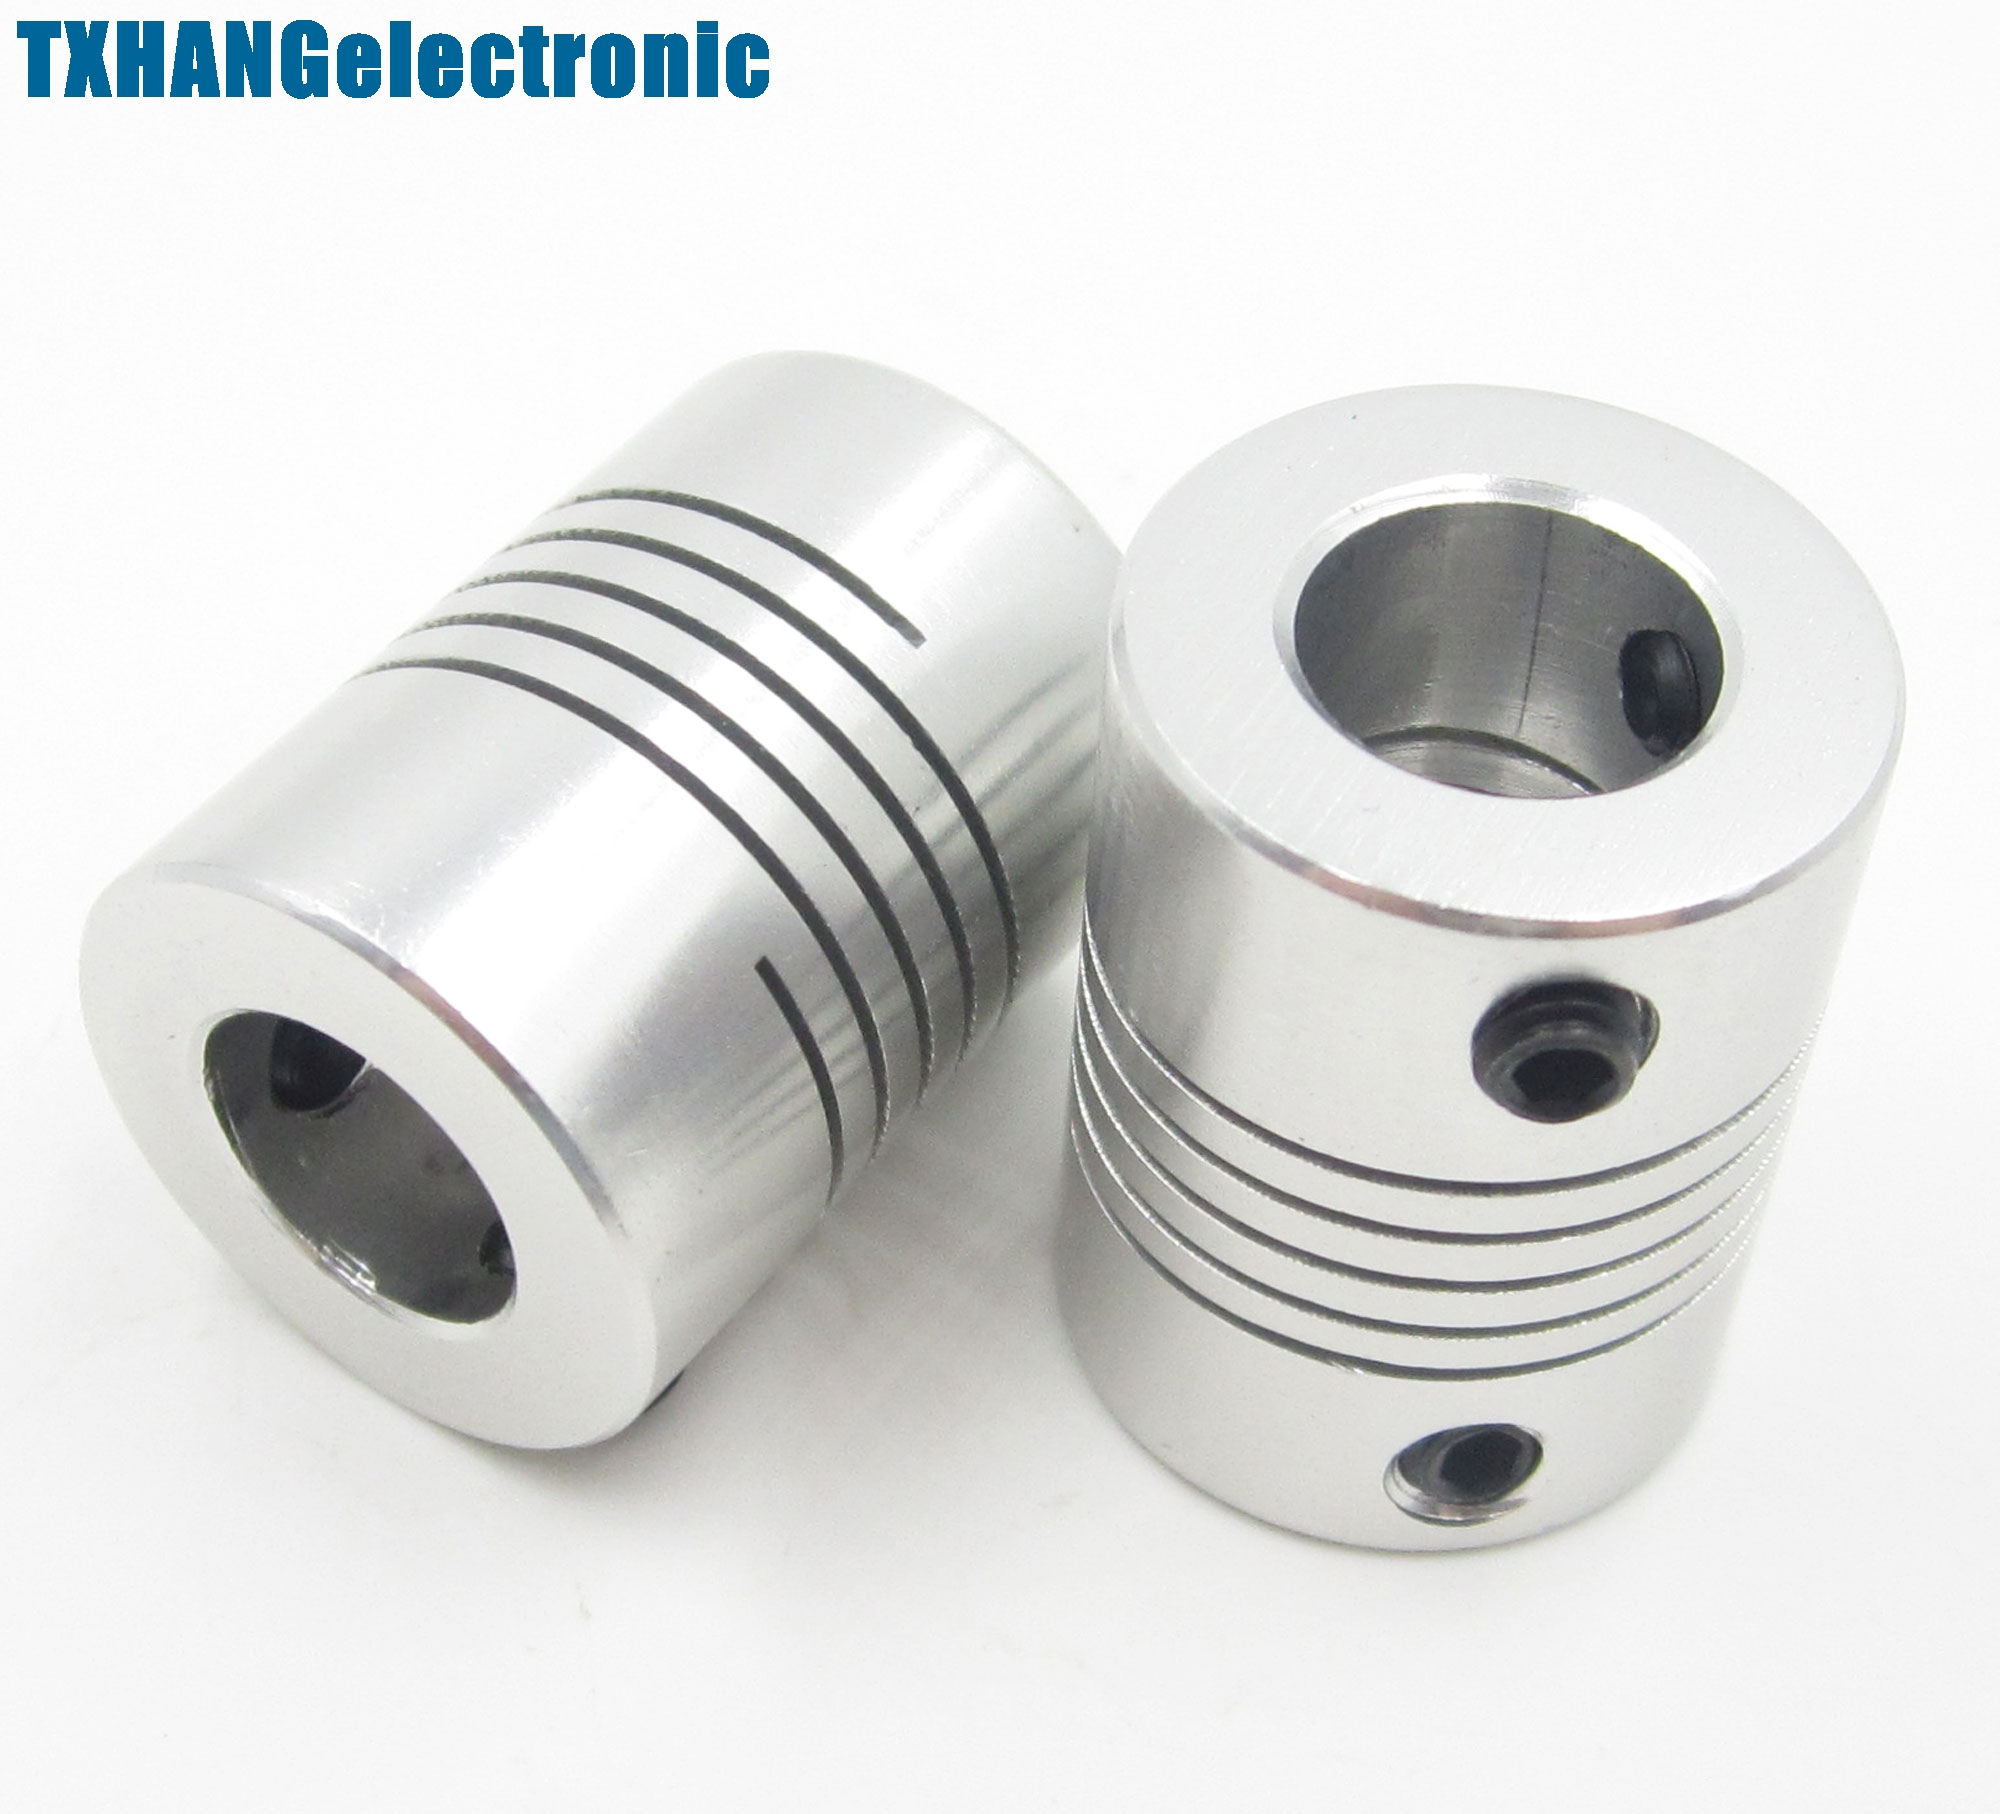 1PCS 5mmx10mm CNC Motor 3D PrinterJaw Shaft Coupler 5mm-10mm Flexible Coupling L